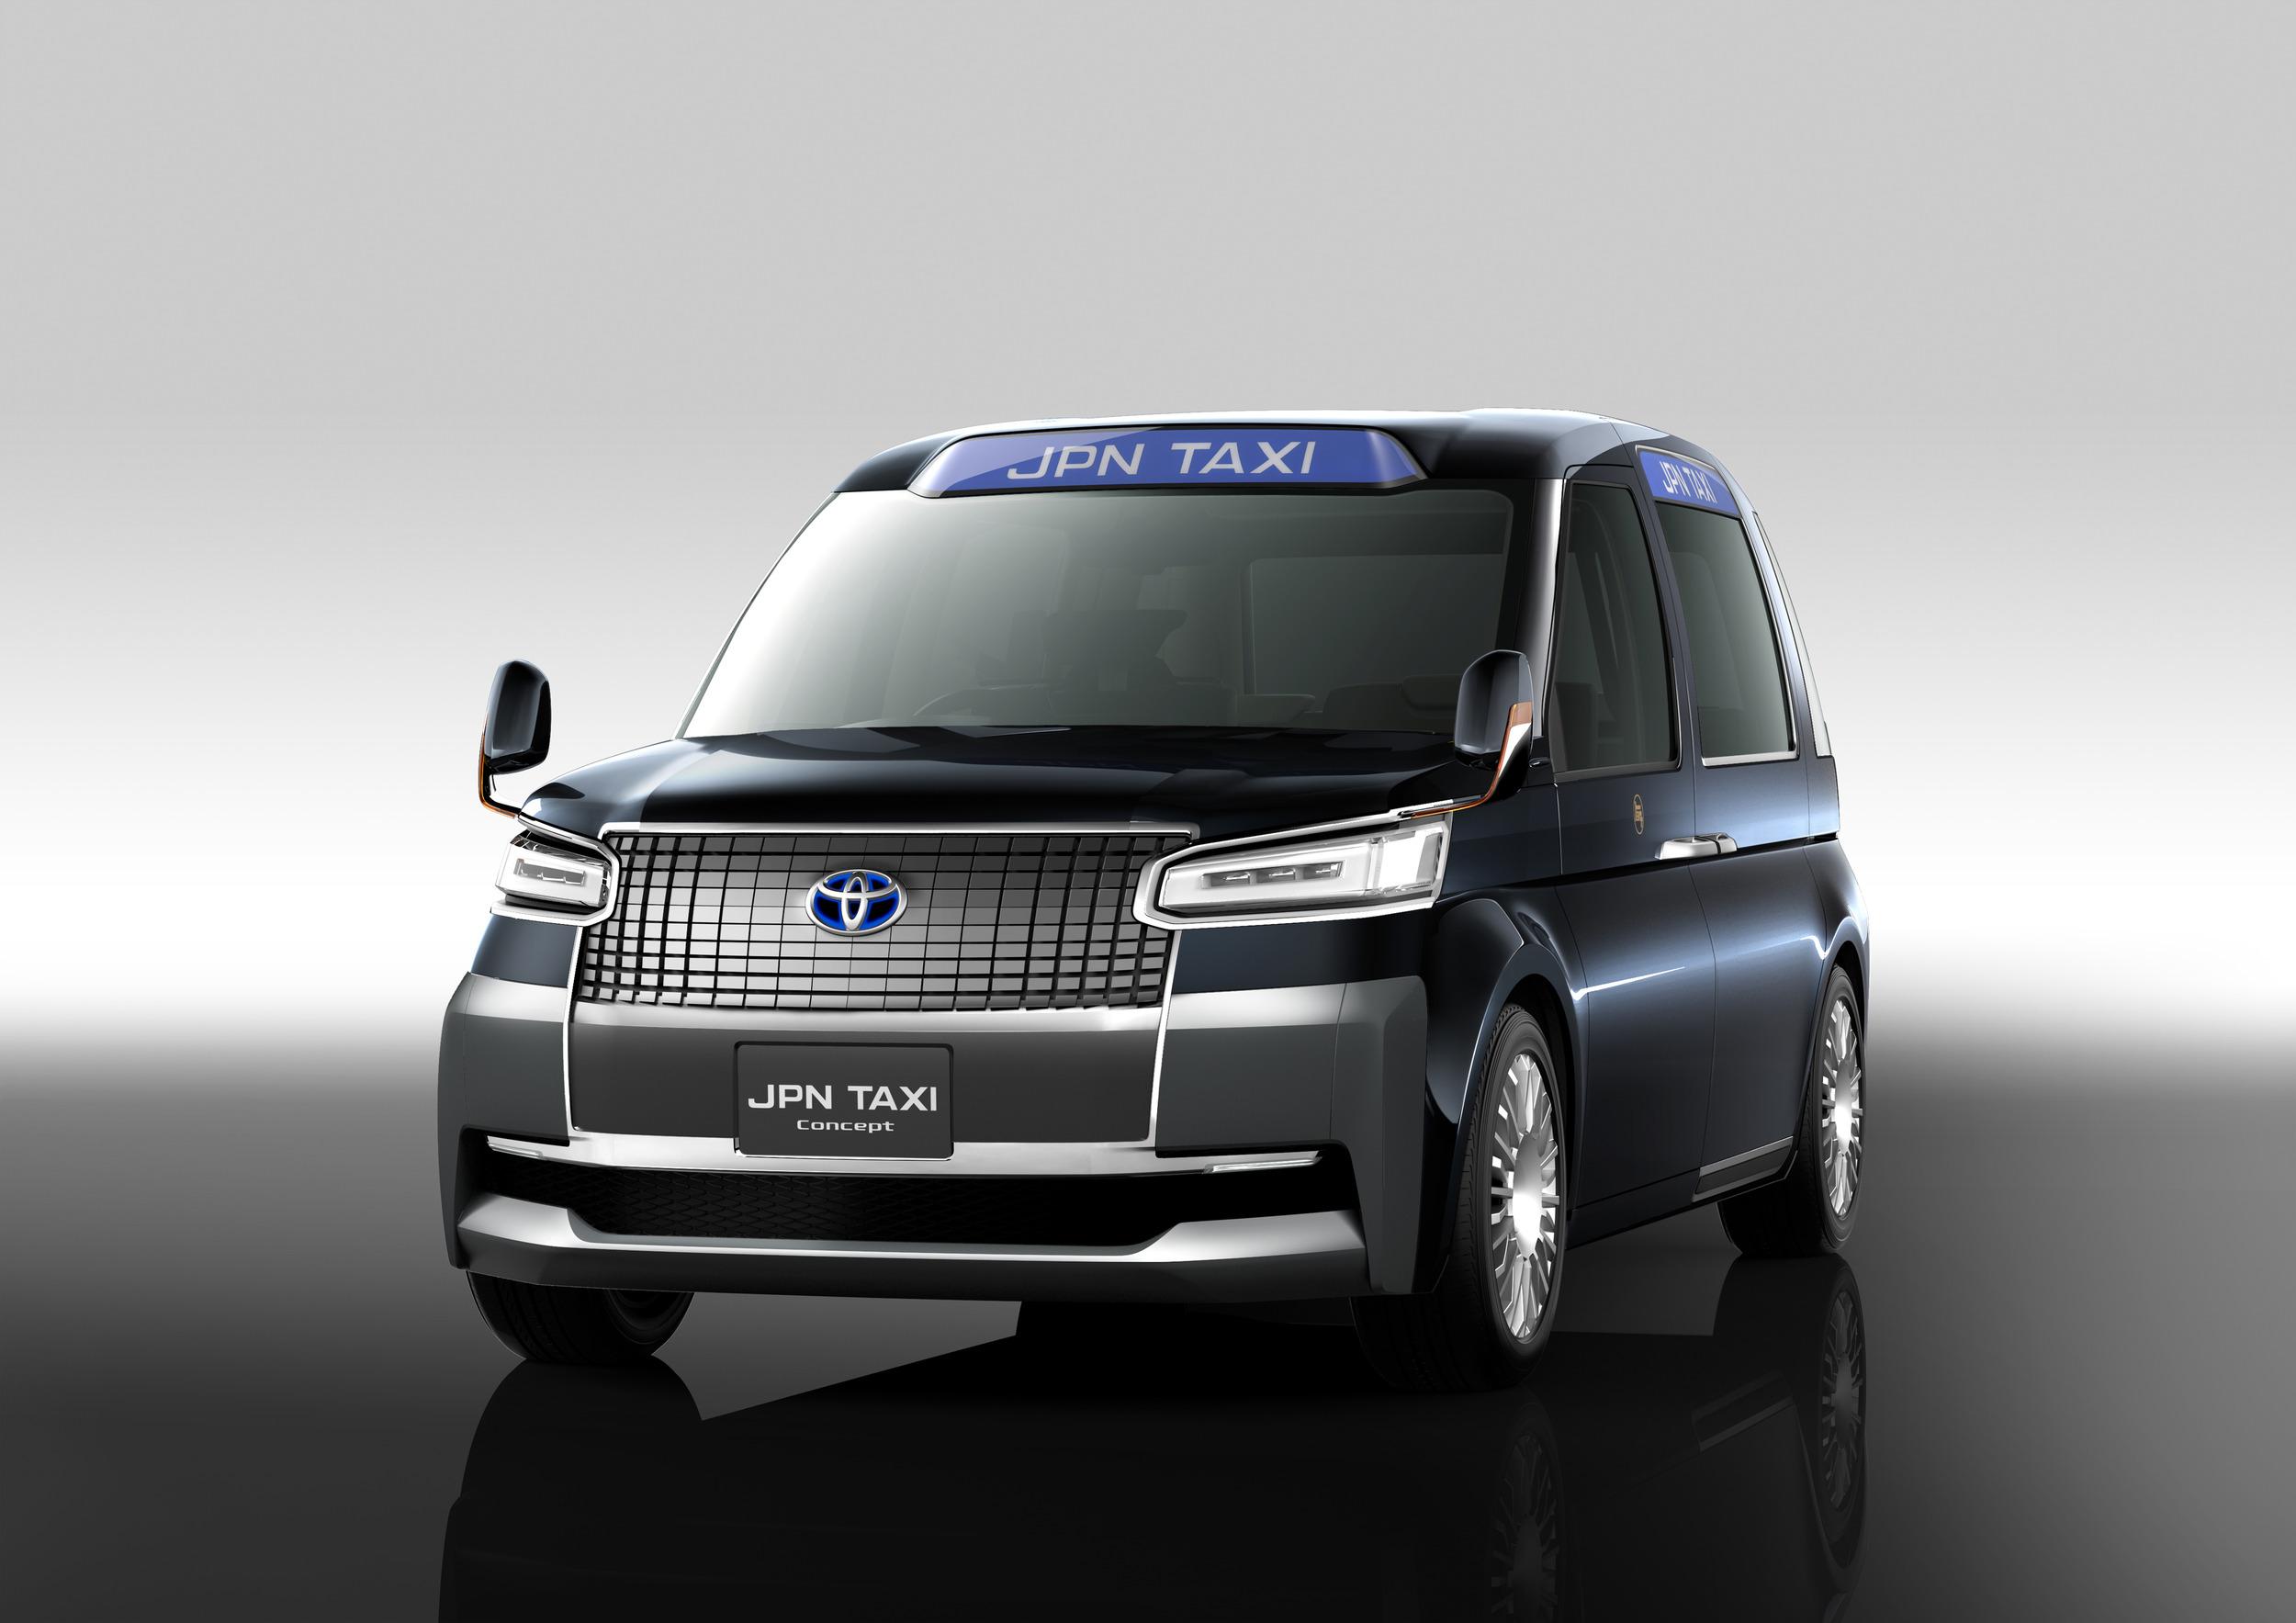 toyota-jpn-taxi-concept-2013-tokyo-motor-show-000-1